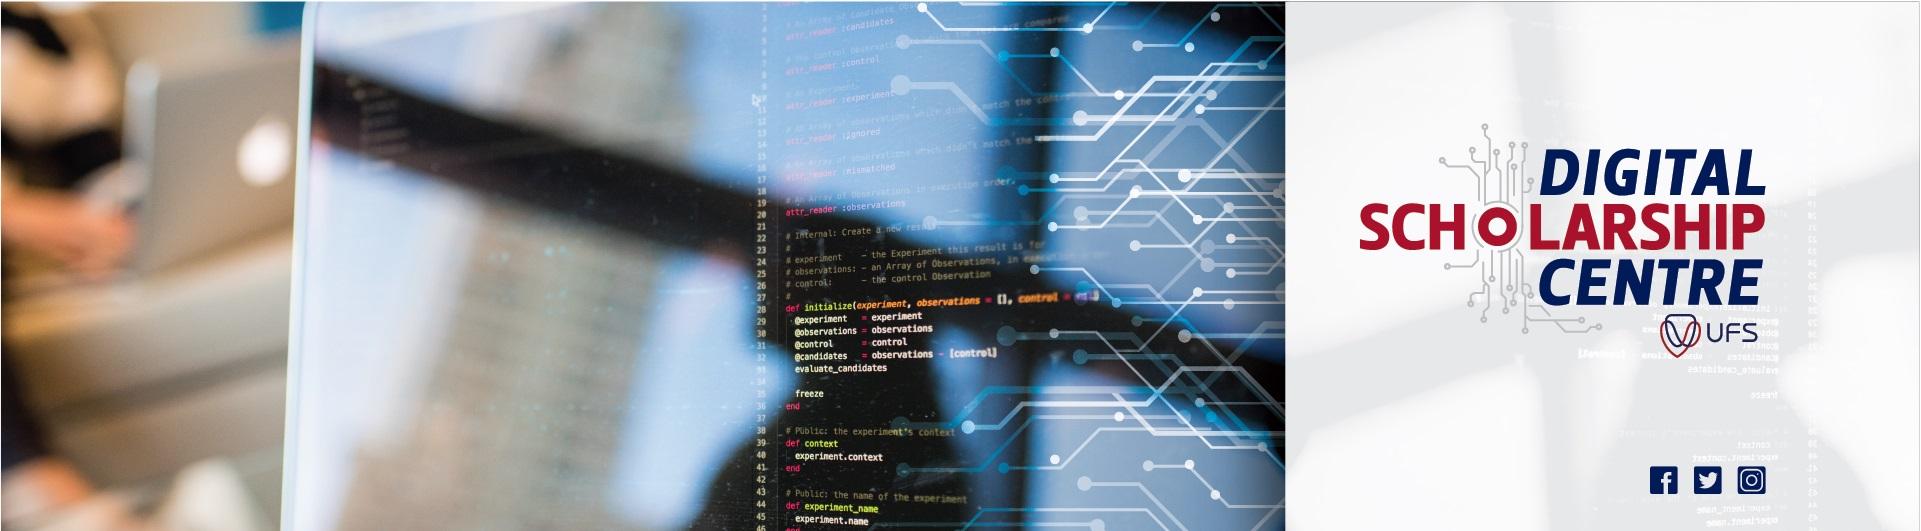 UFS_Digital Scholarship_Centre_Website_Slider-06 screen